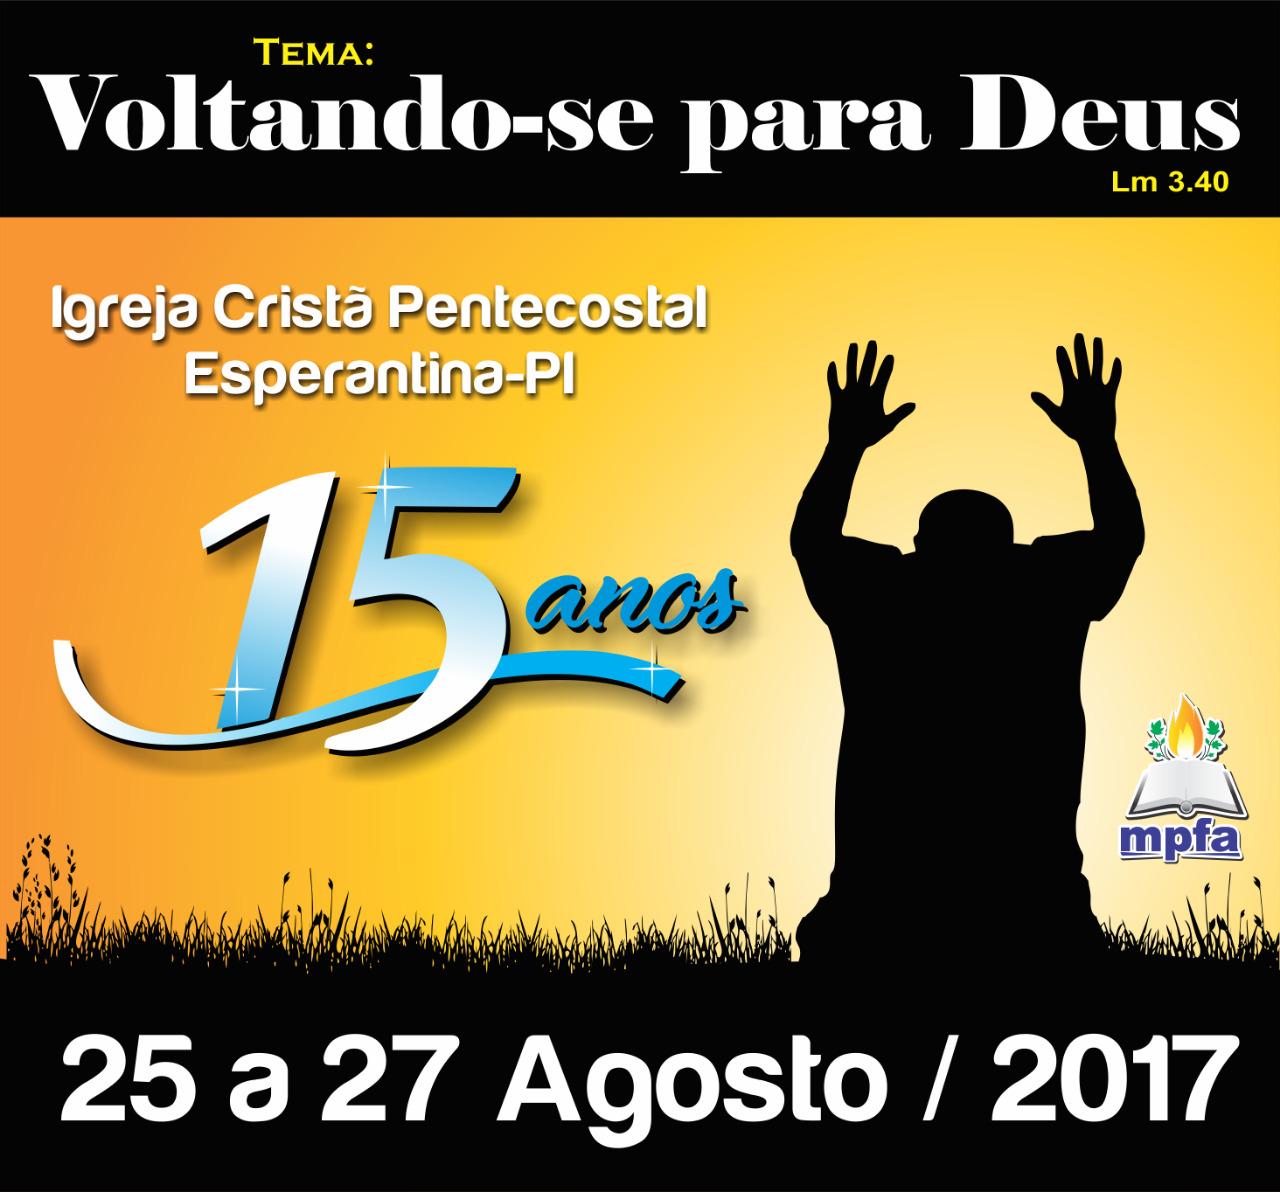 Festa da ICP Esperantina-PI